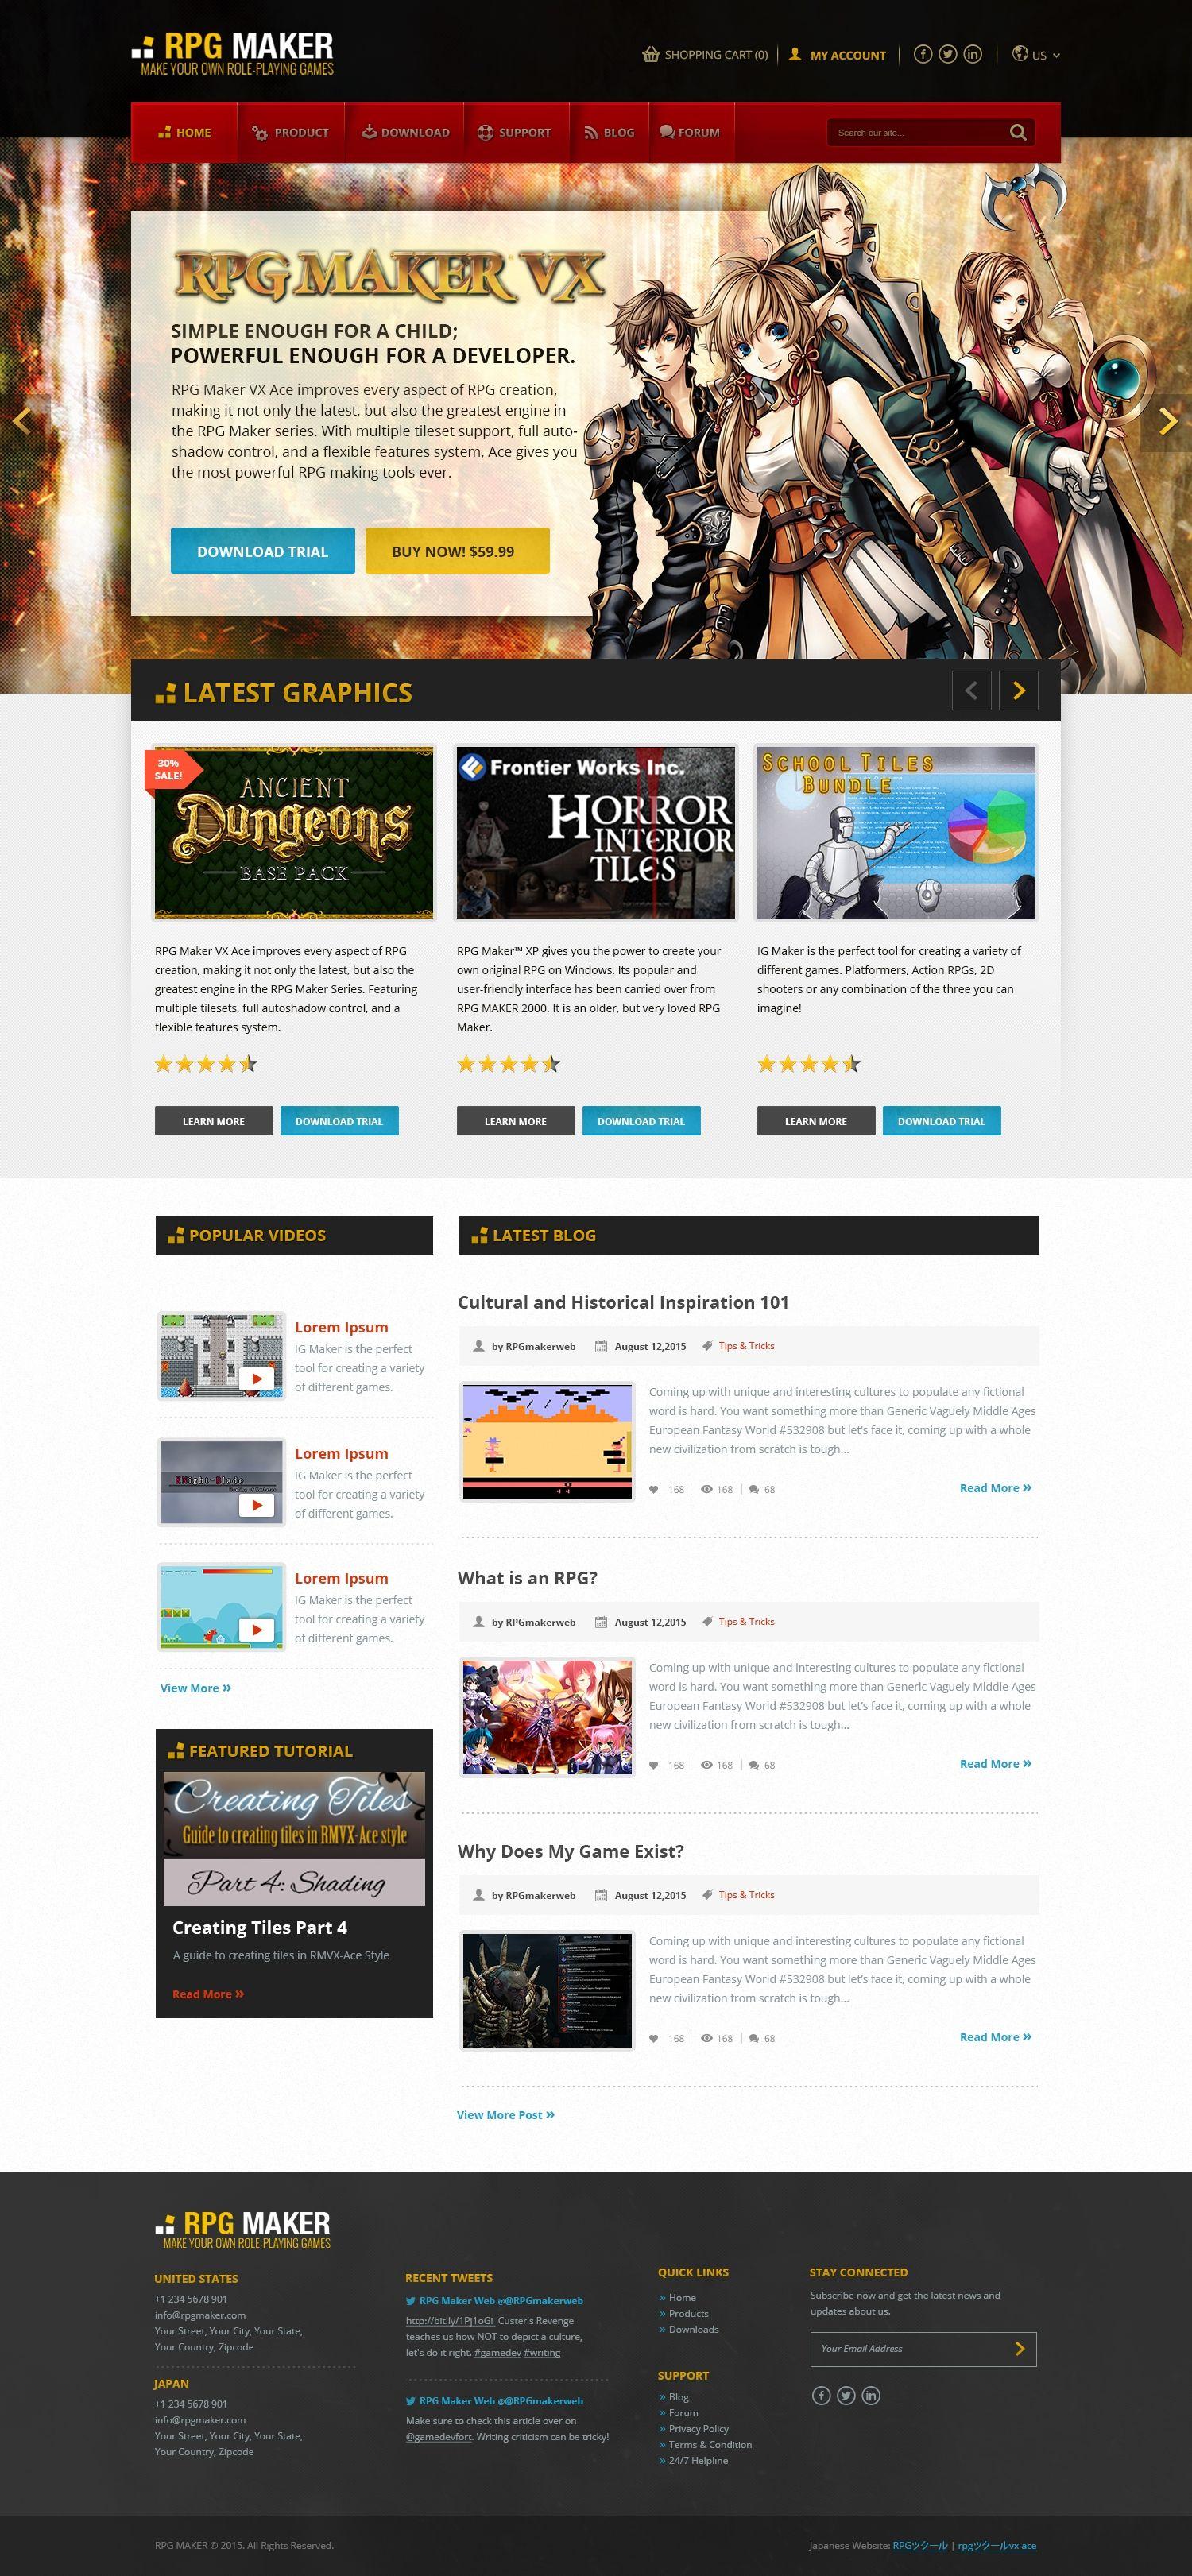 Design #18 by madgrapiks™ | Create a new website design for